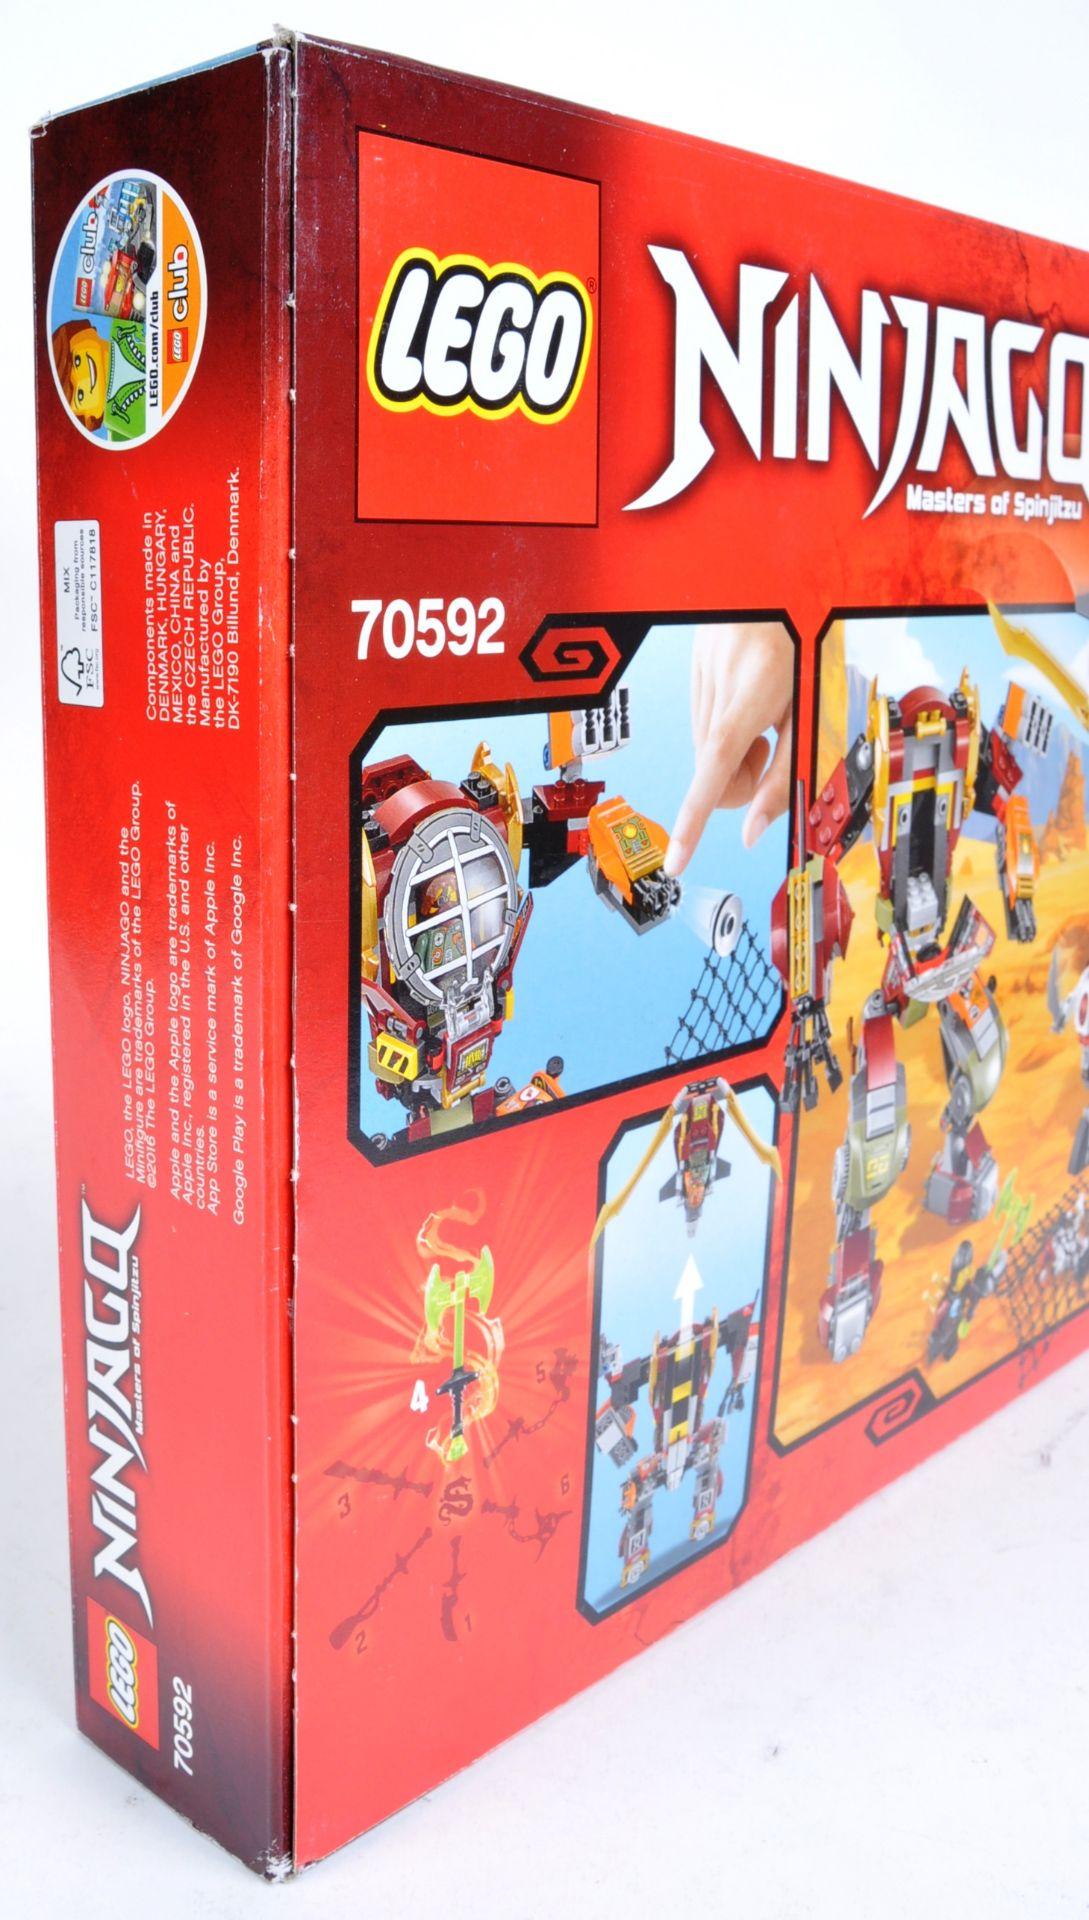 LEGO SETS - LEGO NINJAGO - 70589 / 70592 / 70746 / 70748 - Image 10 of 10